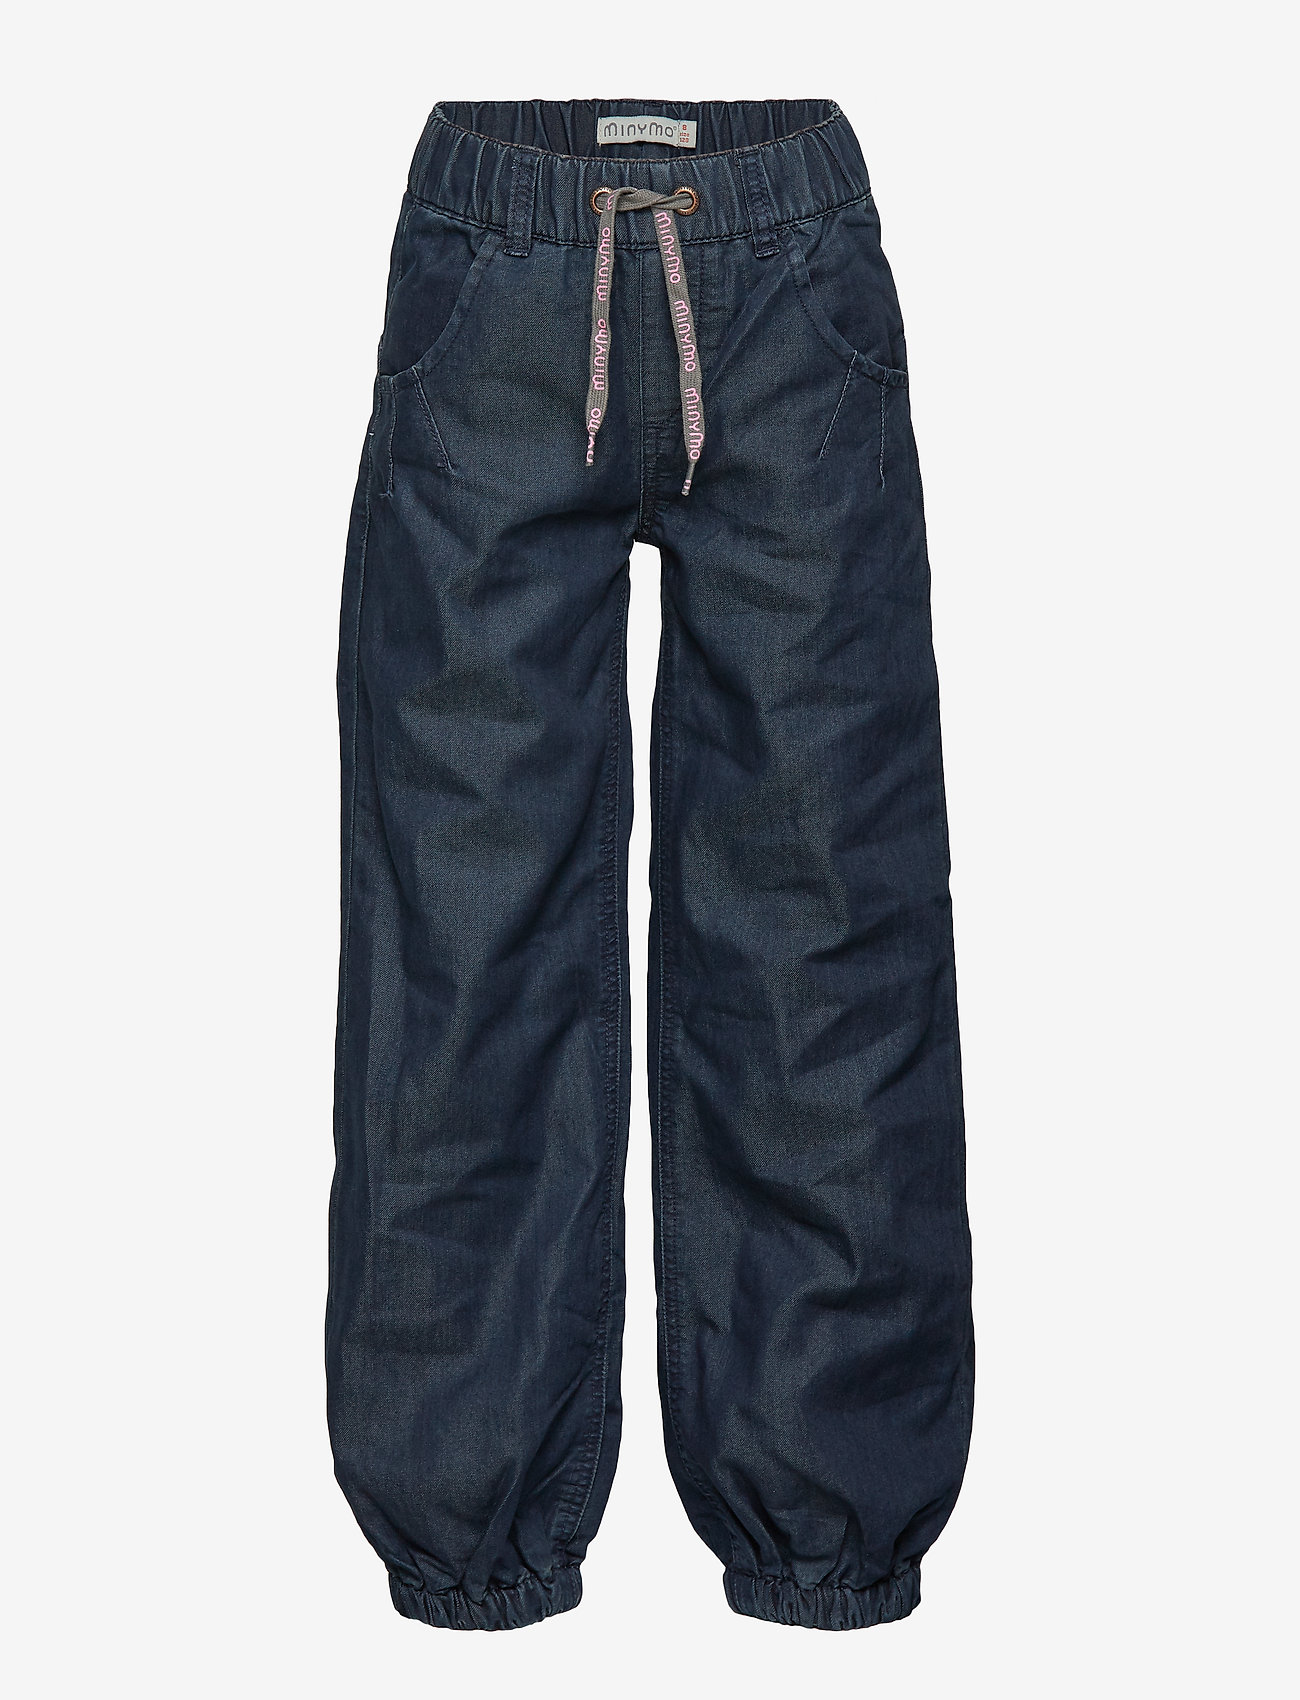 Minymo - Baggy pant -GIRL - trousers - dark blue - 0